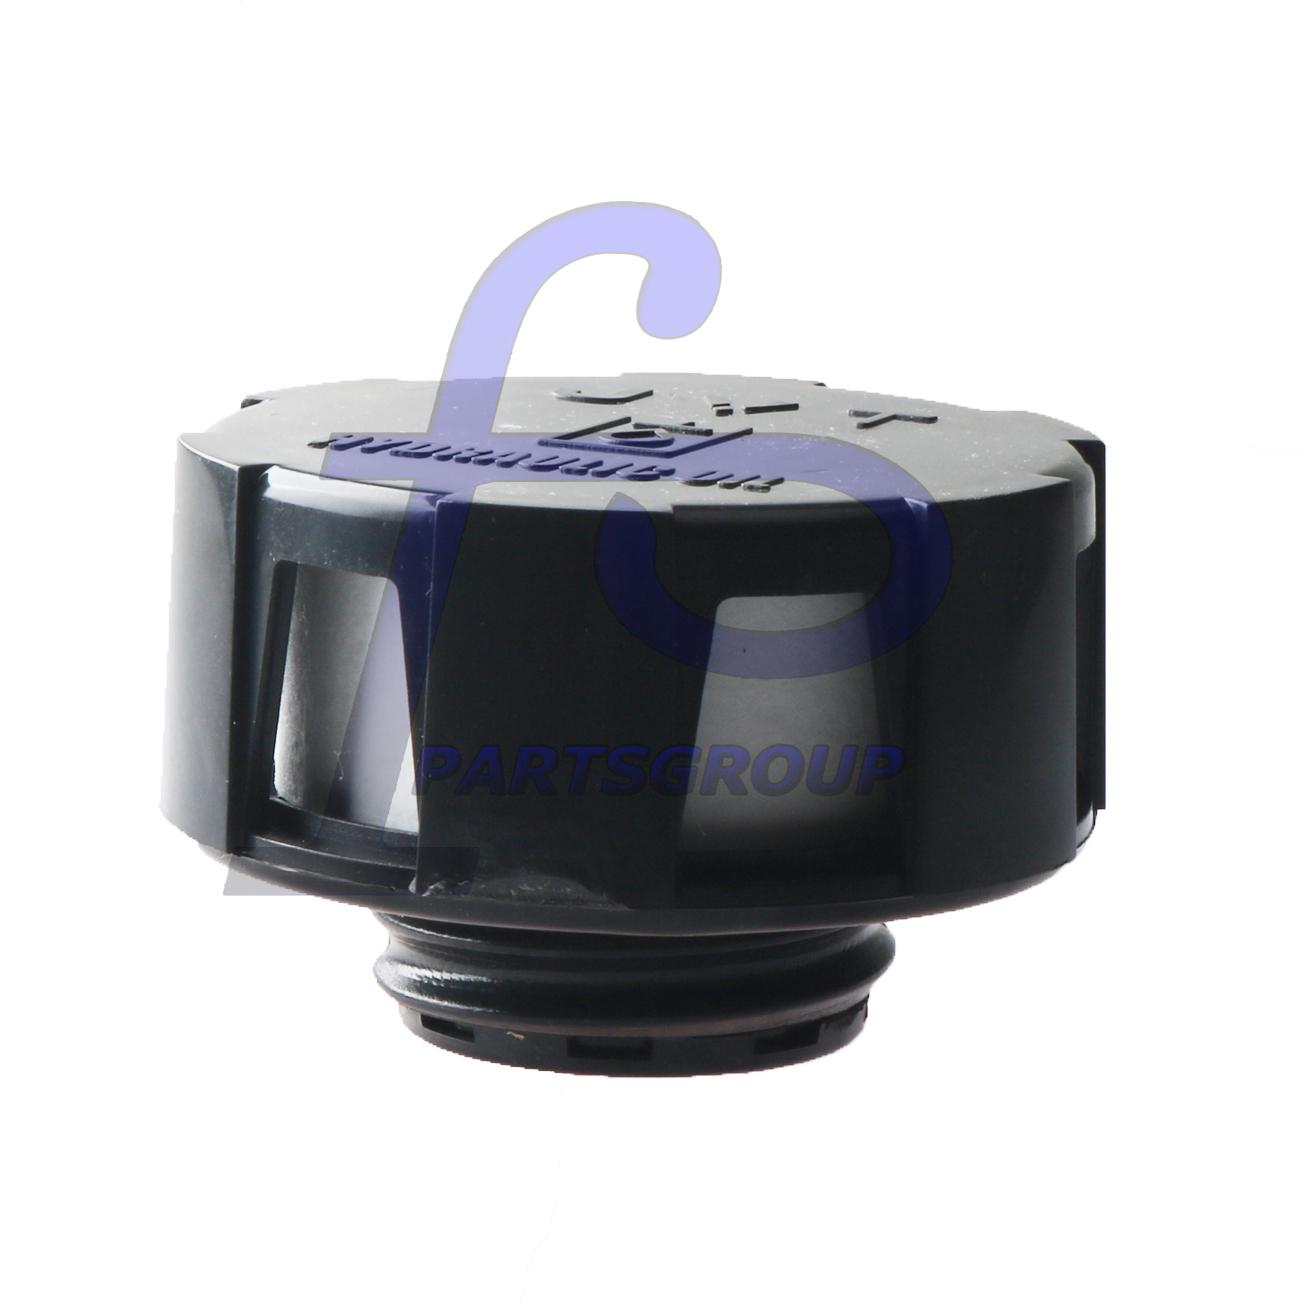 Hydraulic Oil Vent Cap For Bobcat S450 S510 S530 S550 Skid Steer Tank Filler